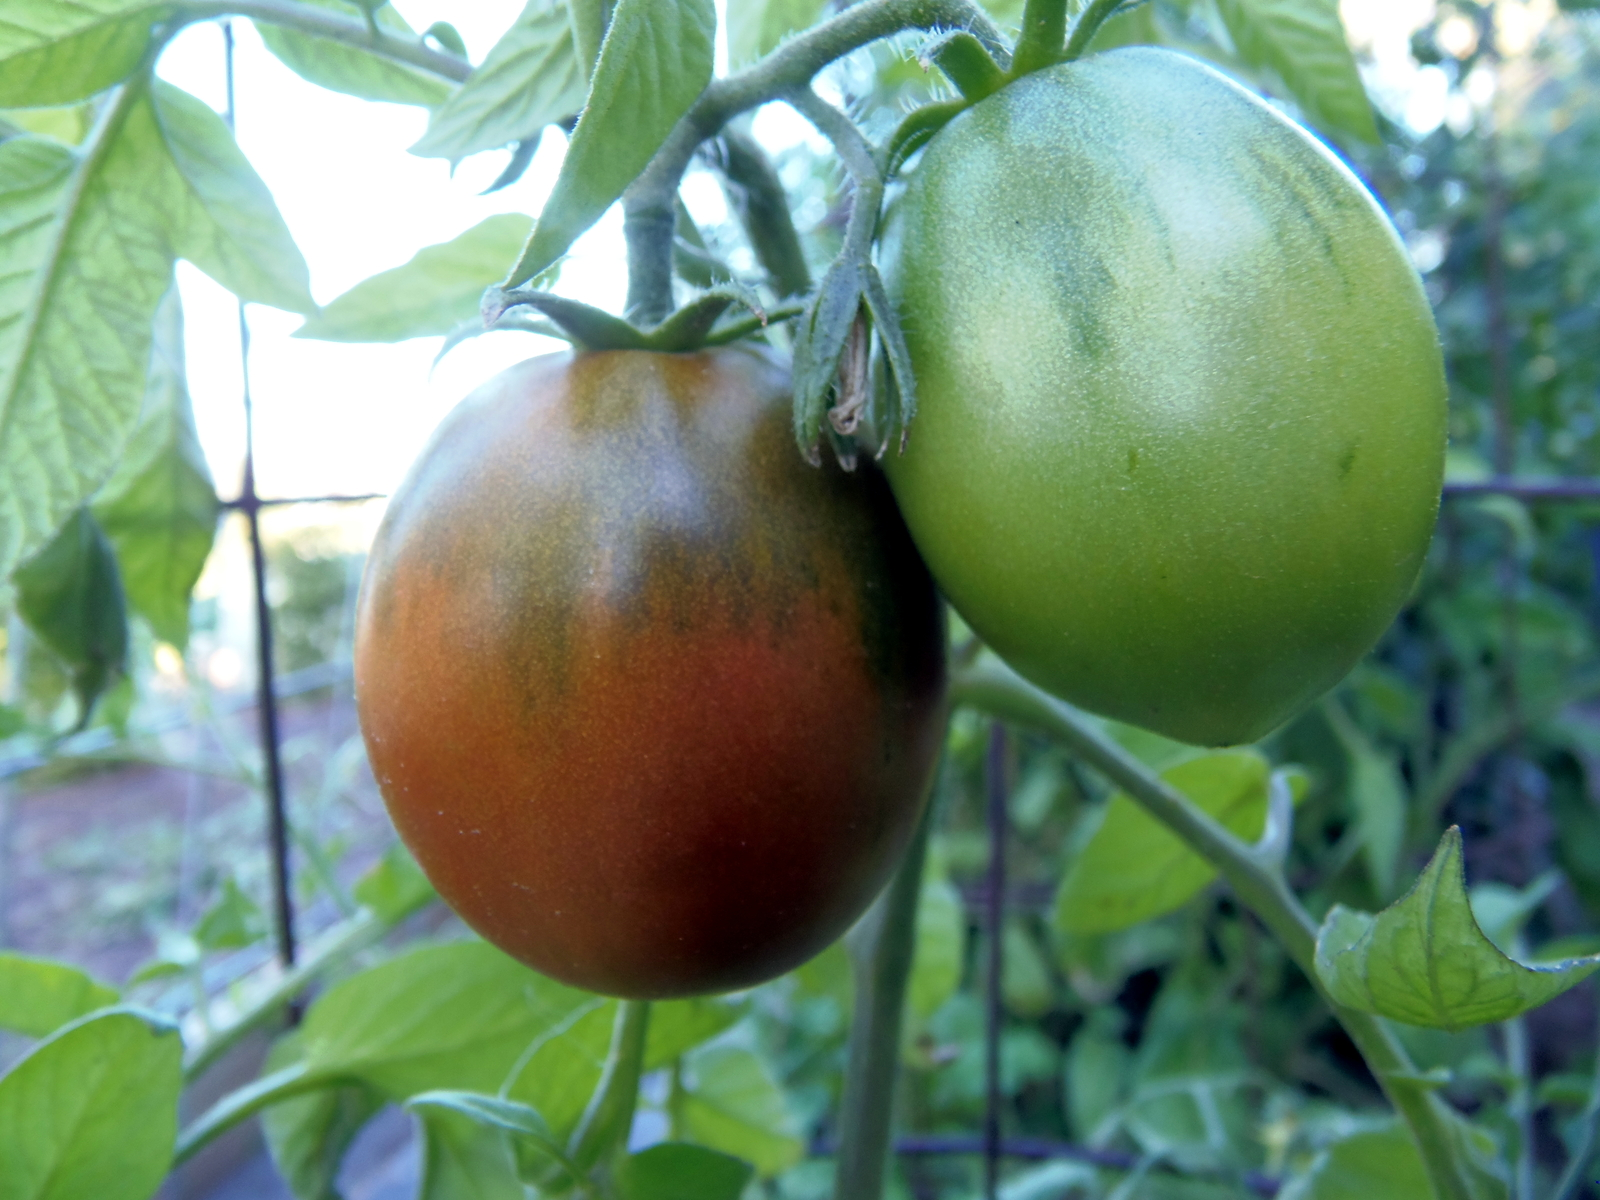 Bedouin tomato seeds